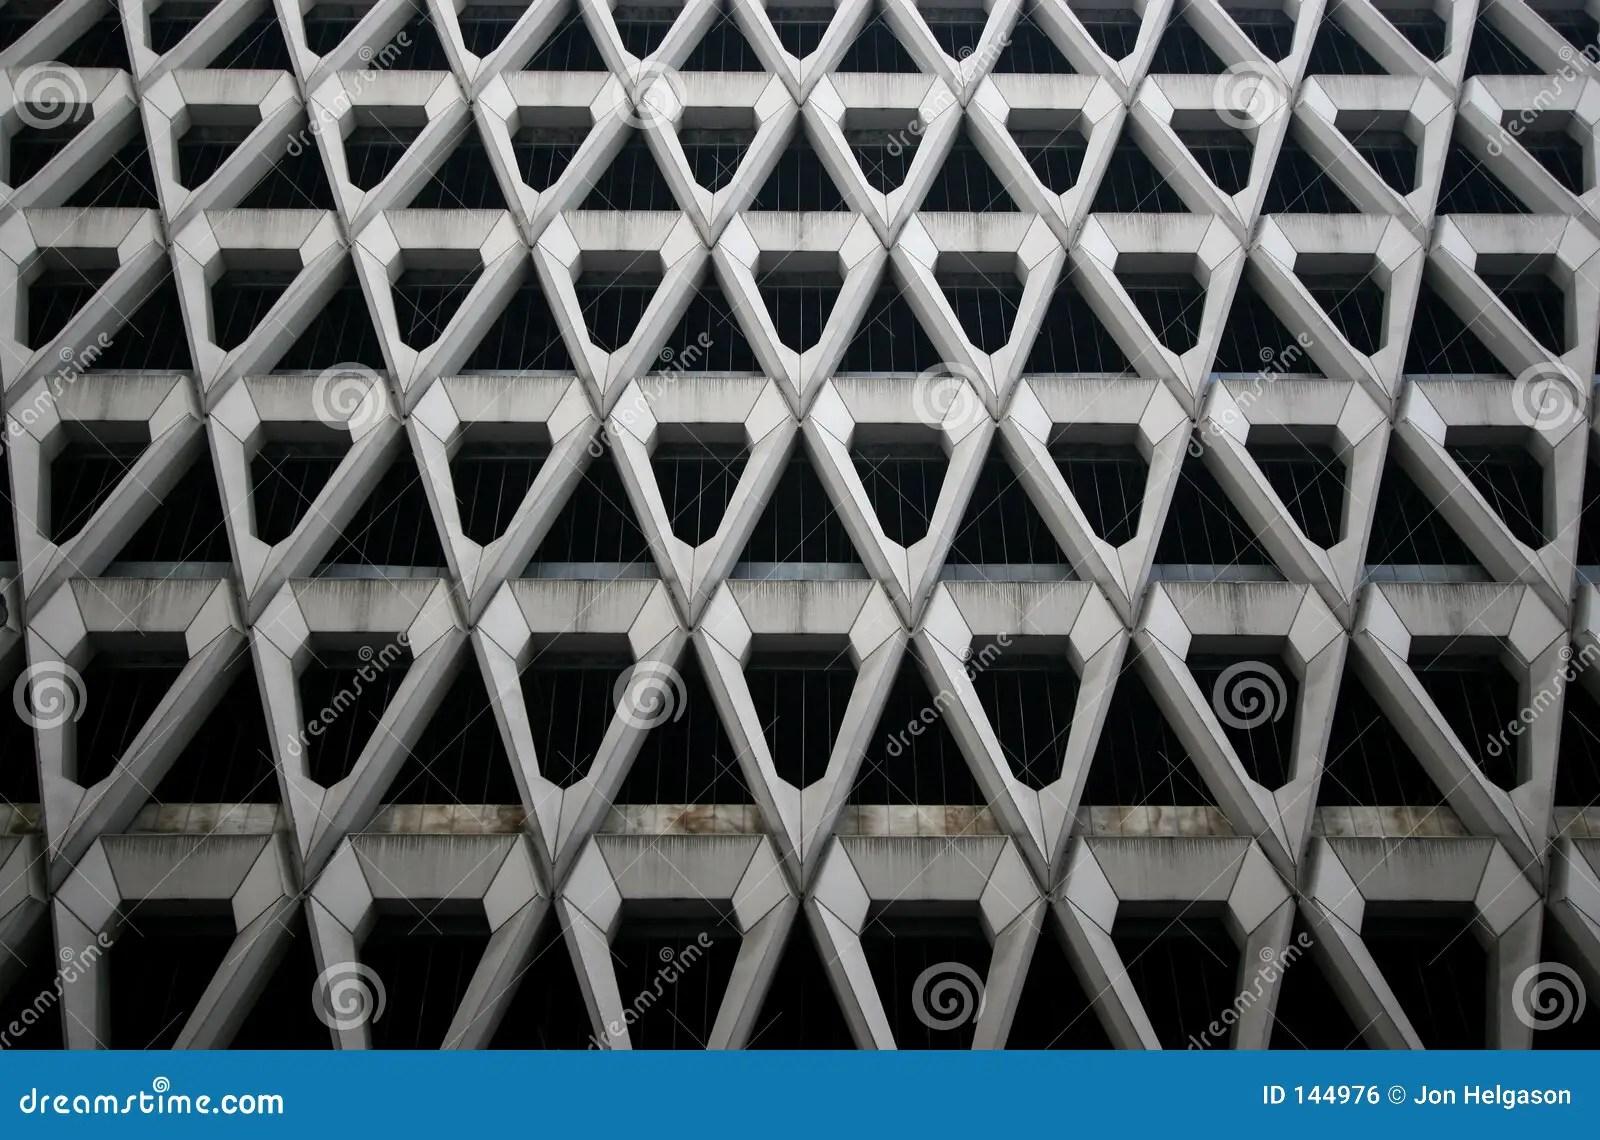 Architecture pattern stock photo Image of modern highrise  144976